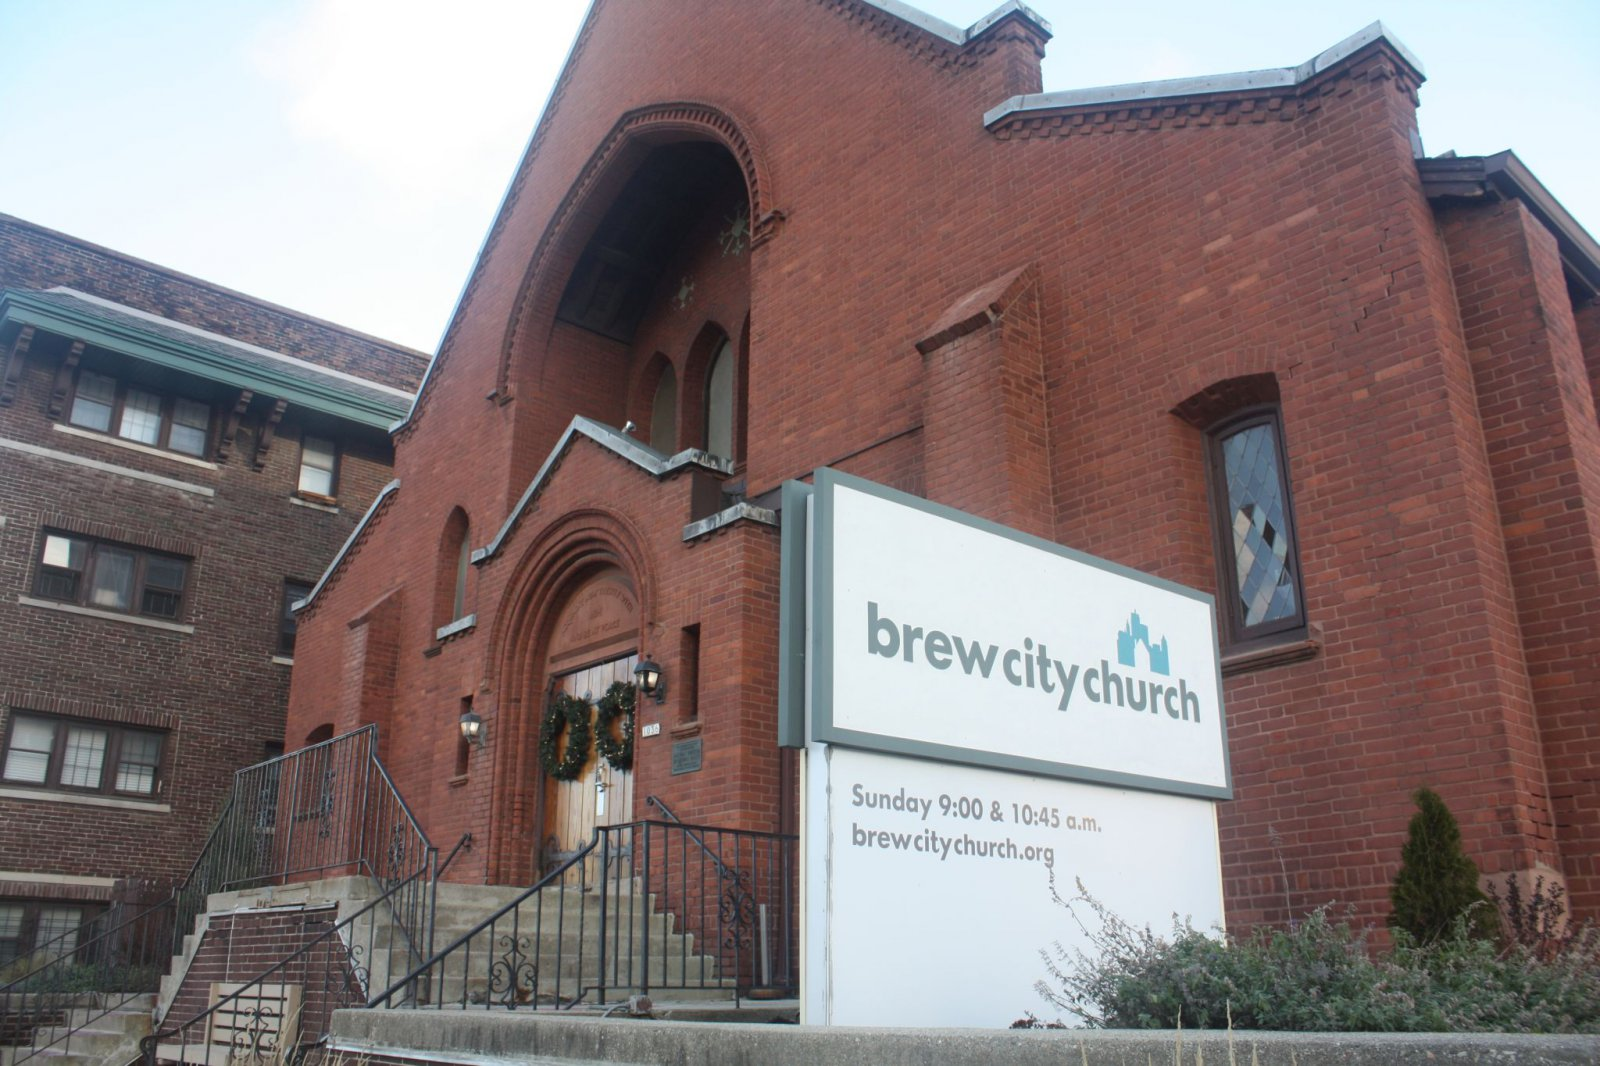 Brew City Church, 1036 N. Van Buren St.